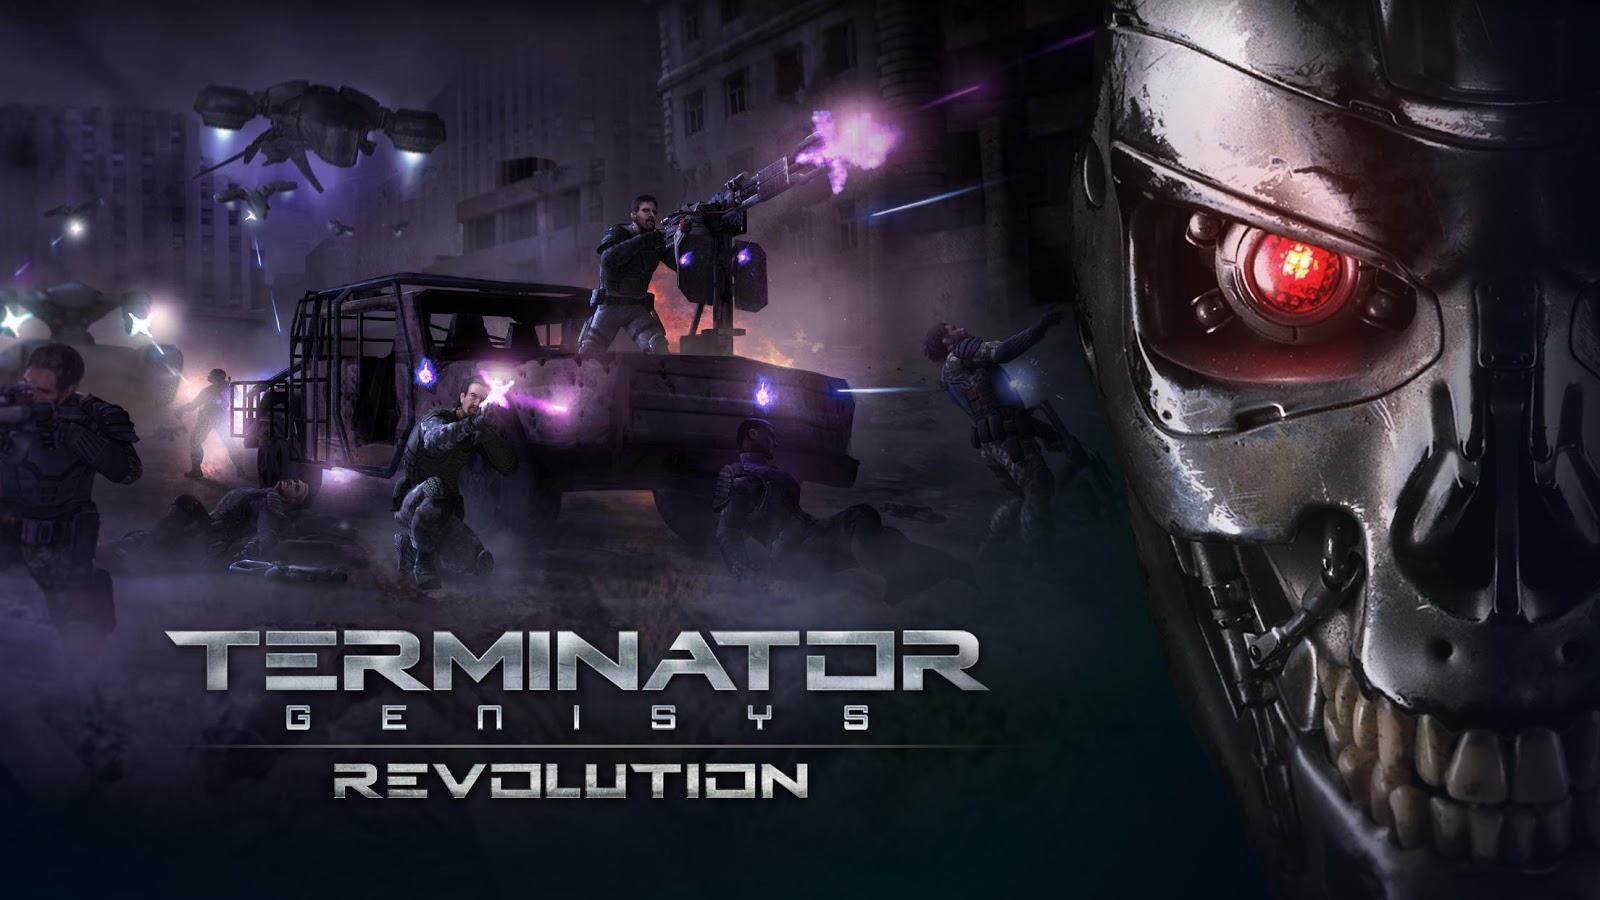 TERMINATOR GENISYS: REVOLUTION - screenshot